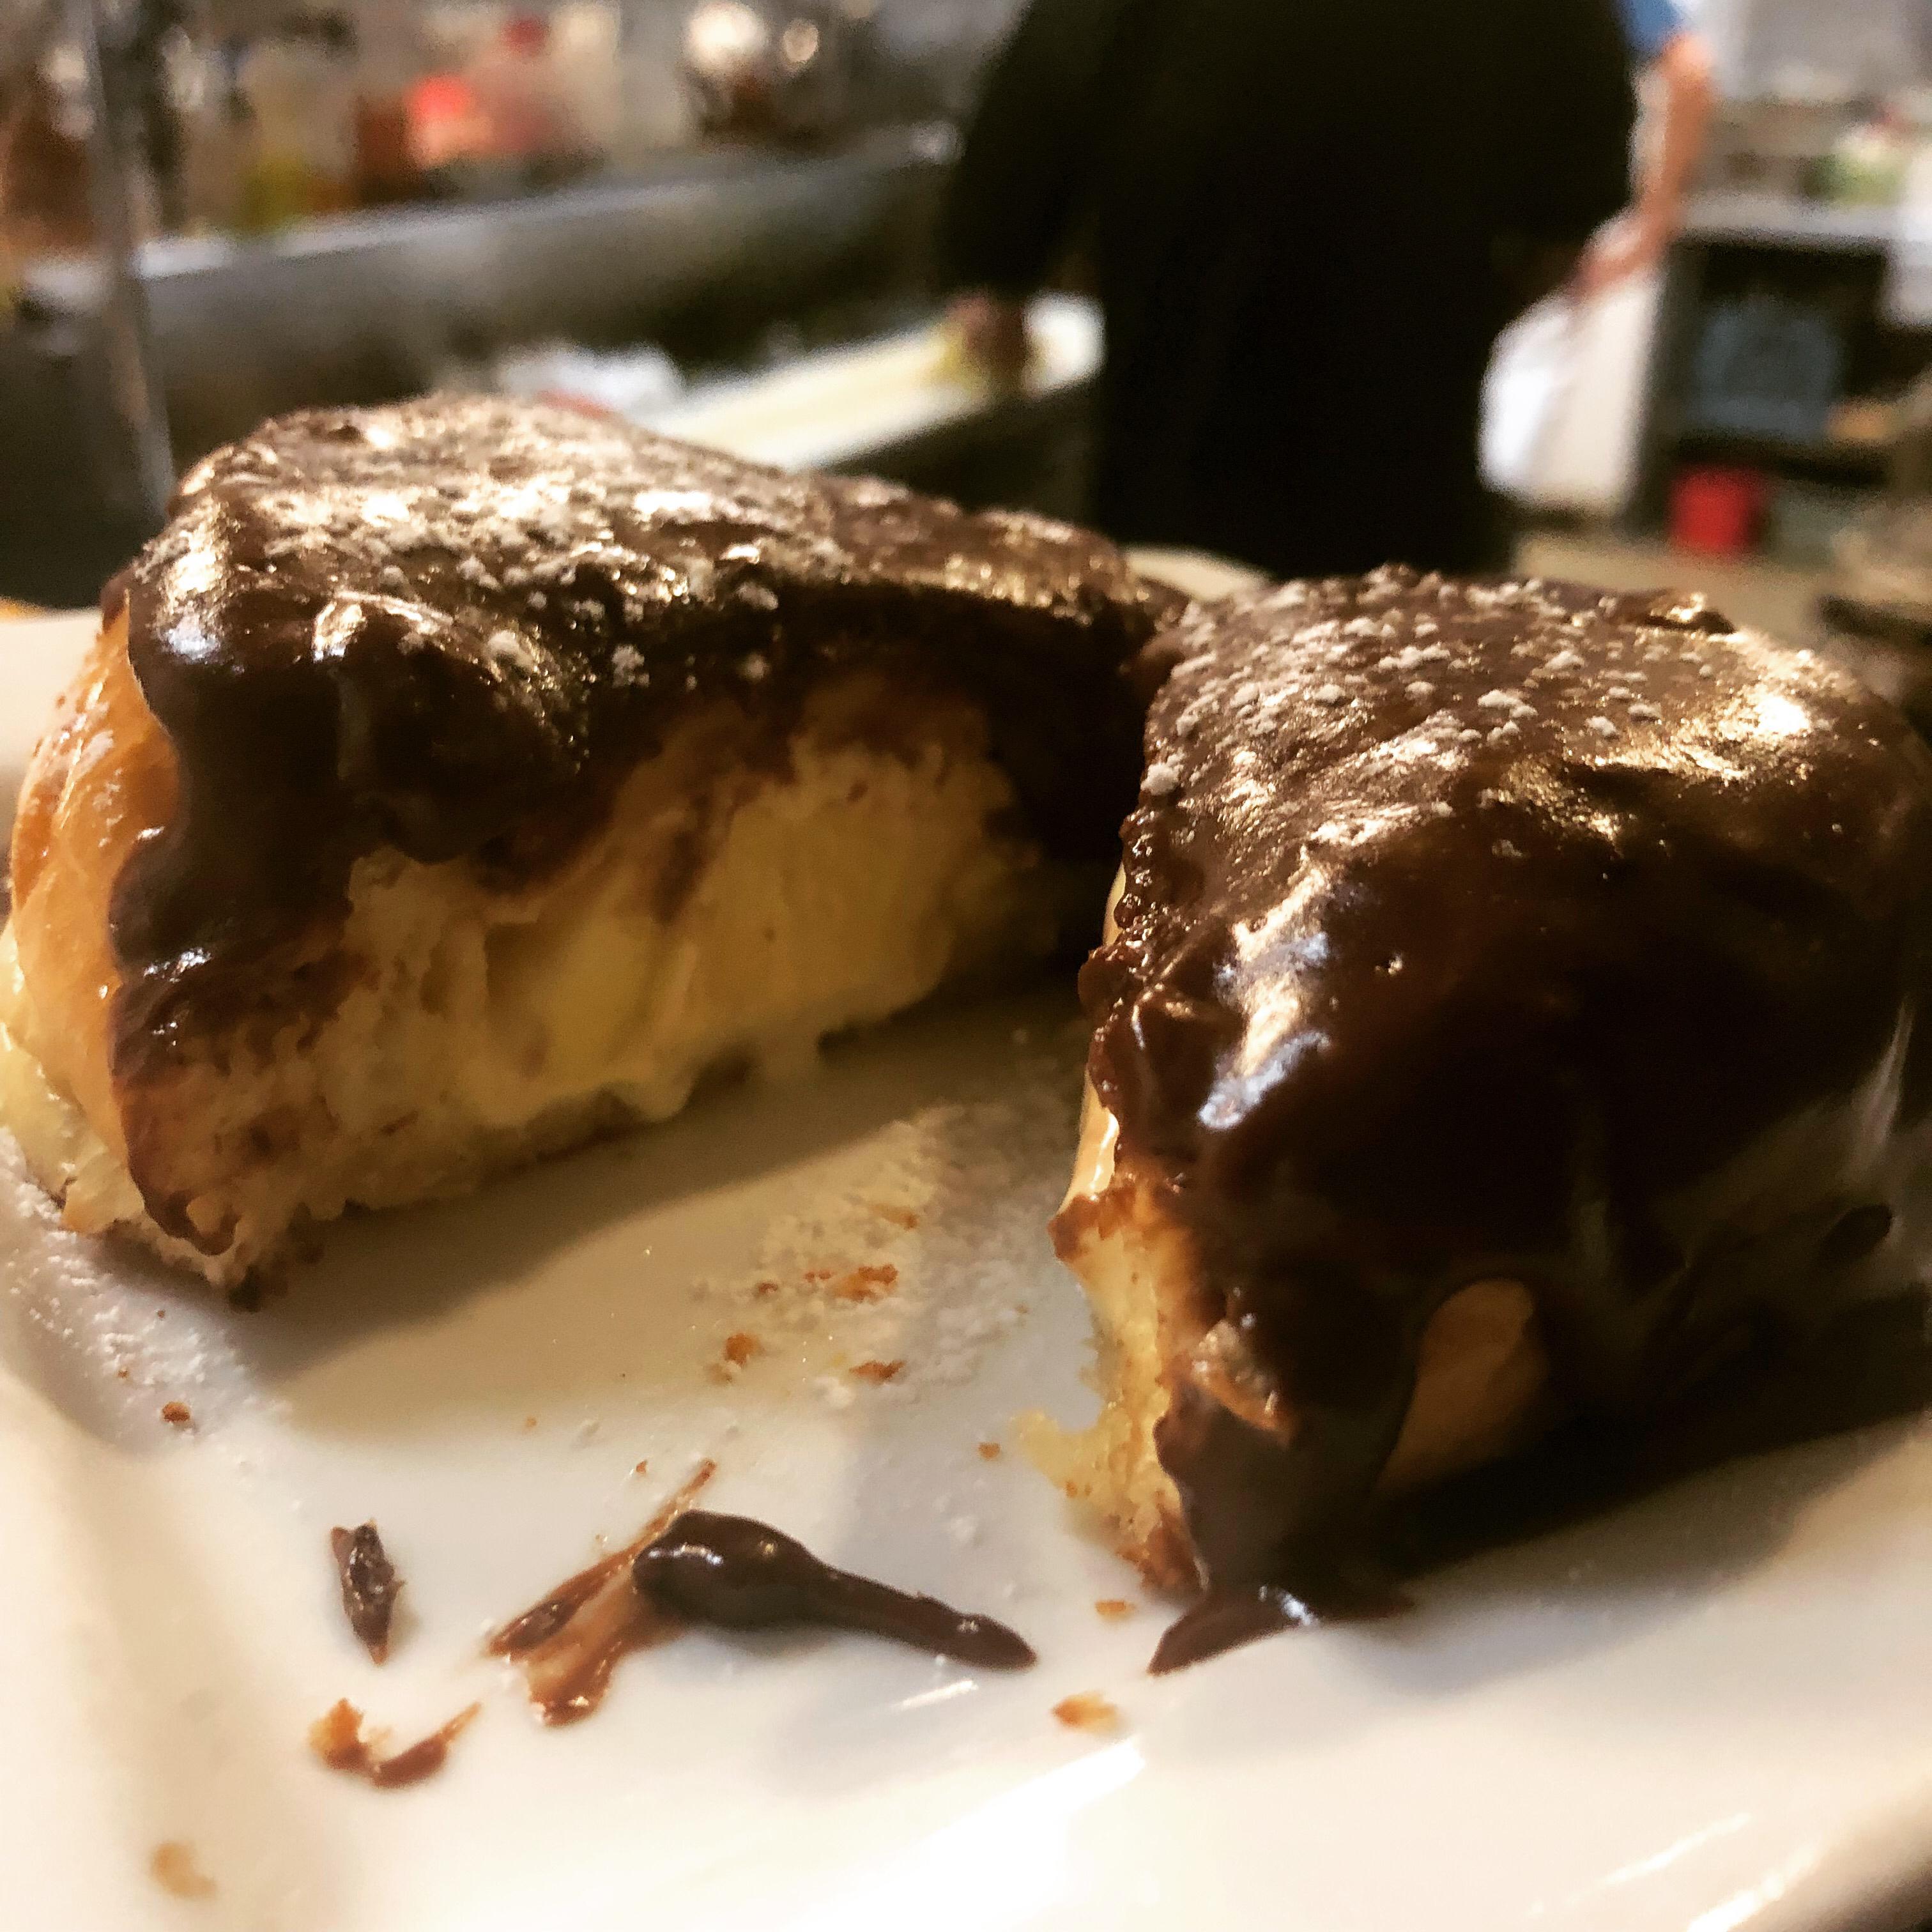 Art's Southern-Style Chocolate Gravy